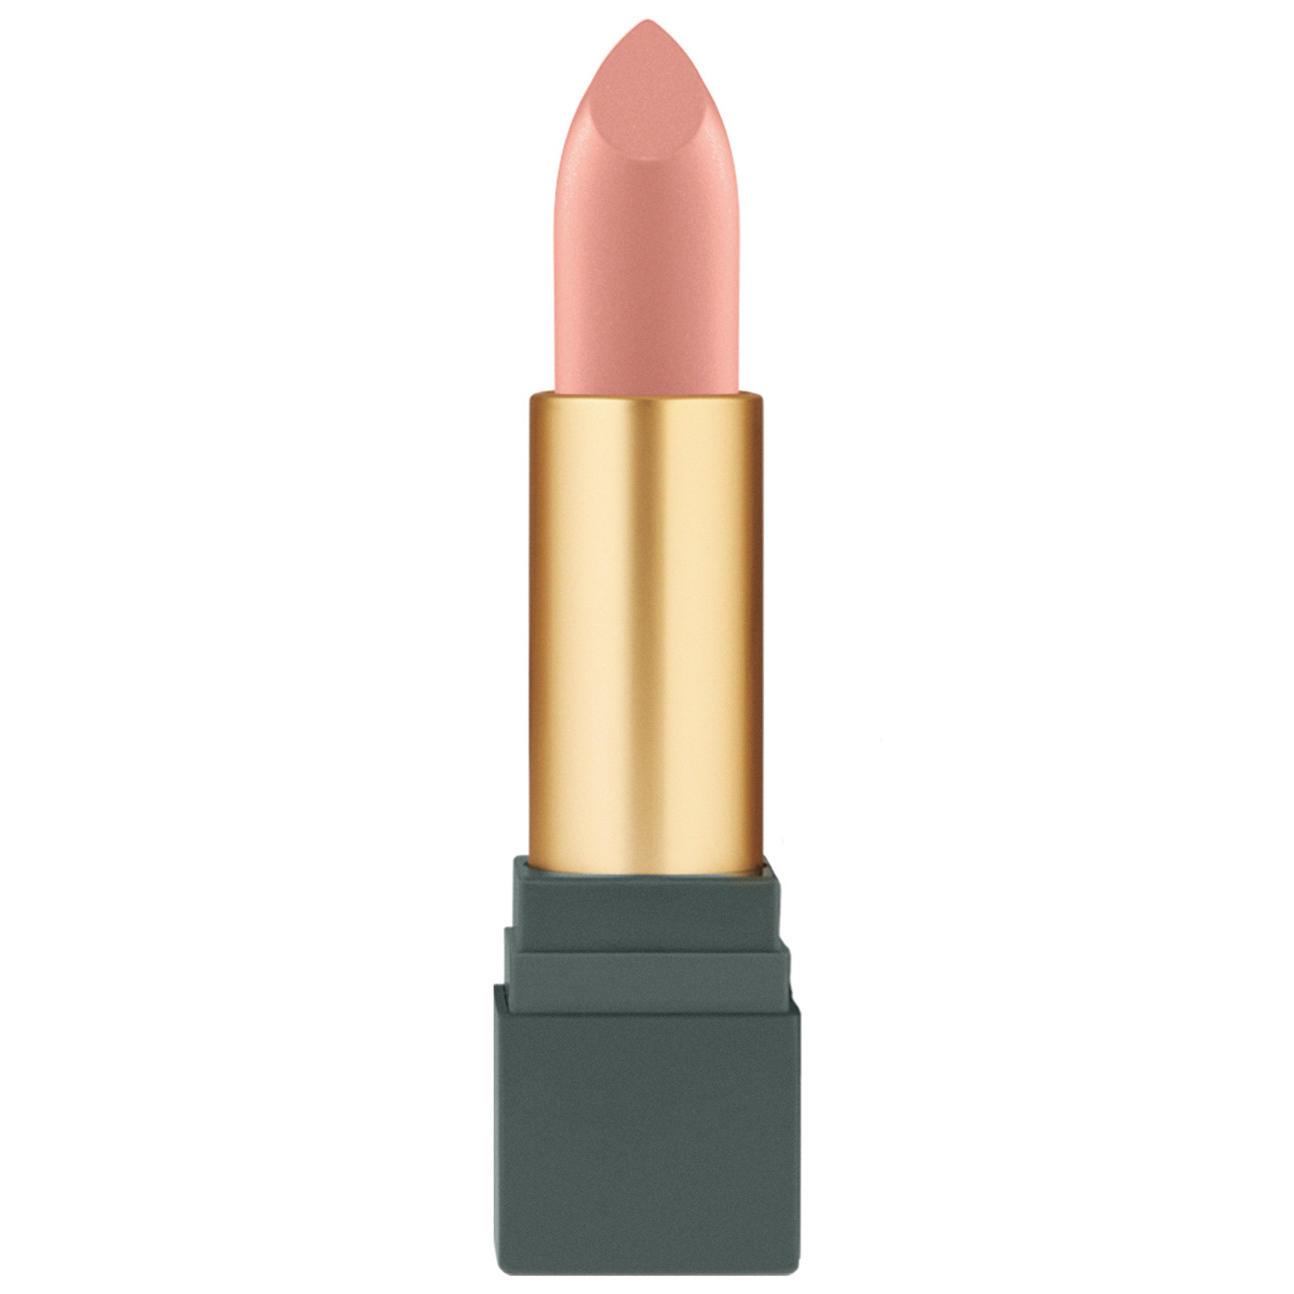 MAC Lipstick Zac Posen Collection Sheer Madness